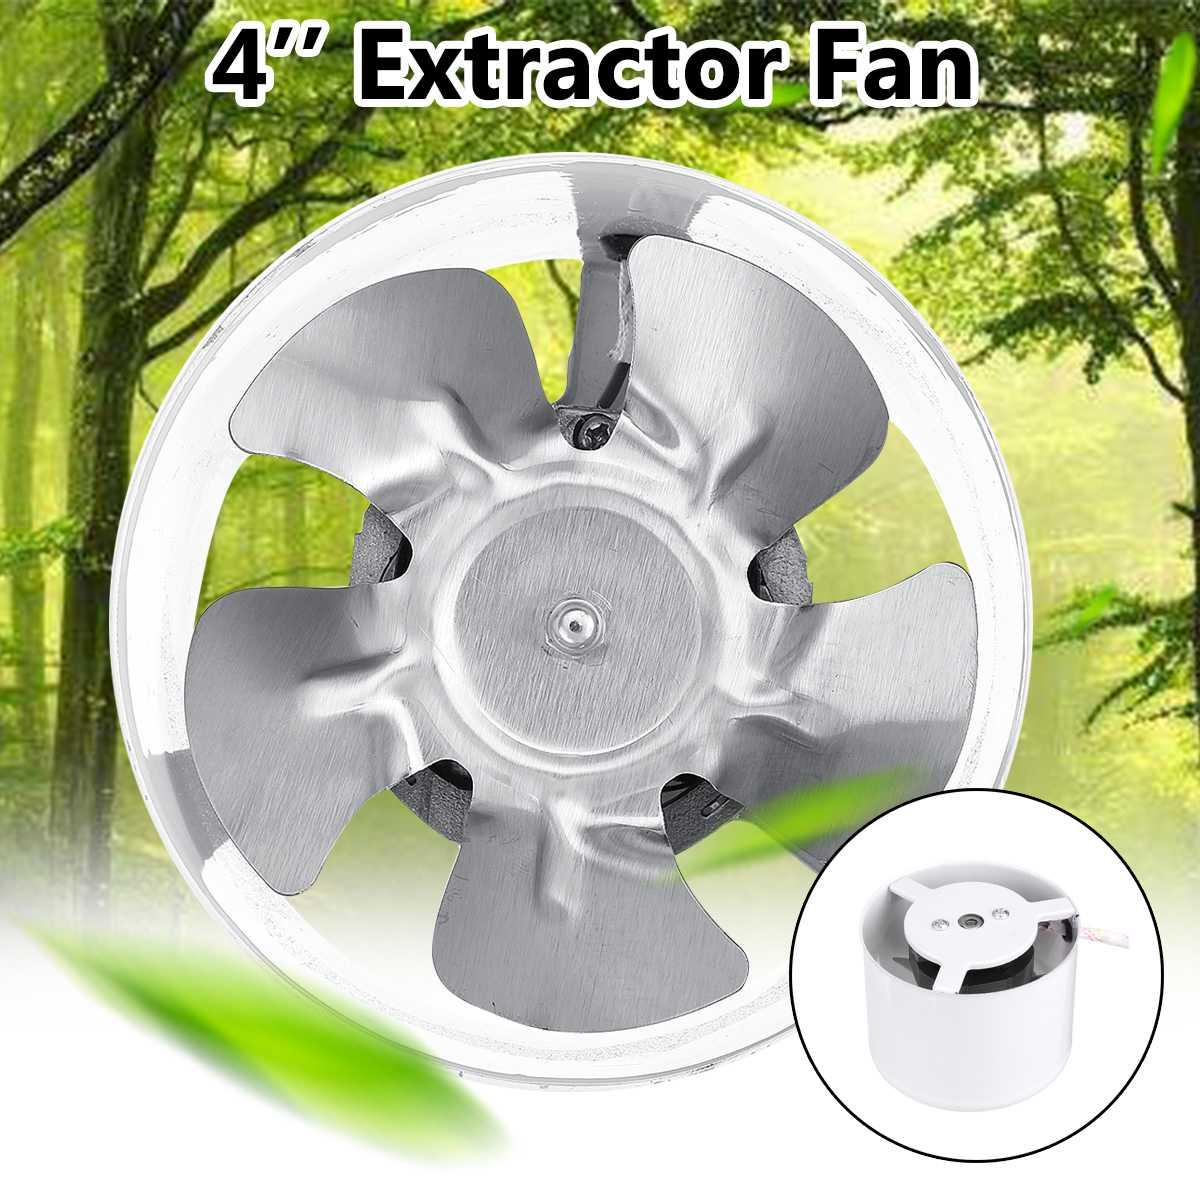 US $12 82 23% OFF|4 inch 100mm Round Duct Fan High Speed Exhaust Fan  Toilets Window Ventilation Quiet Industrial Exhaust Ventilate Air Vent  Fan-in